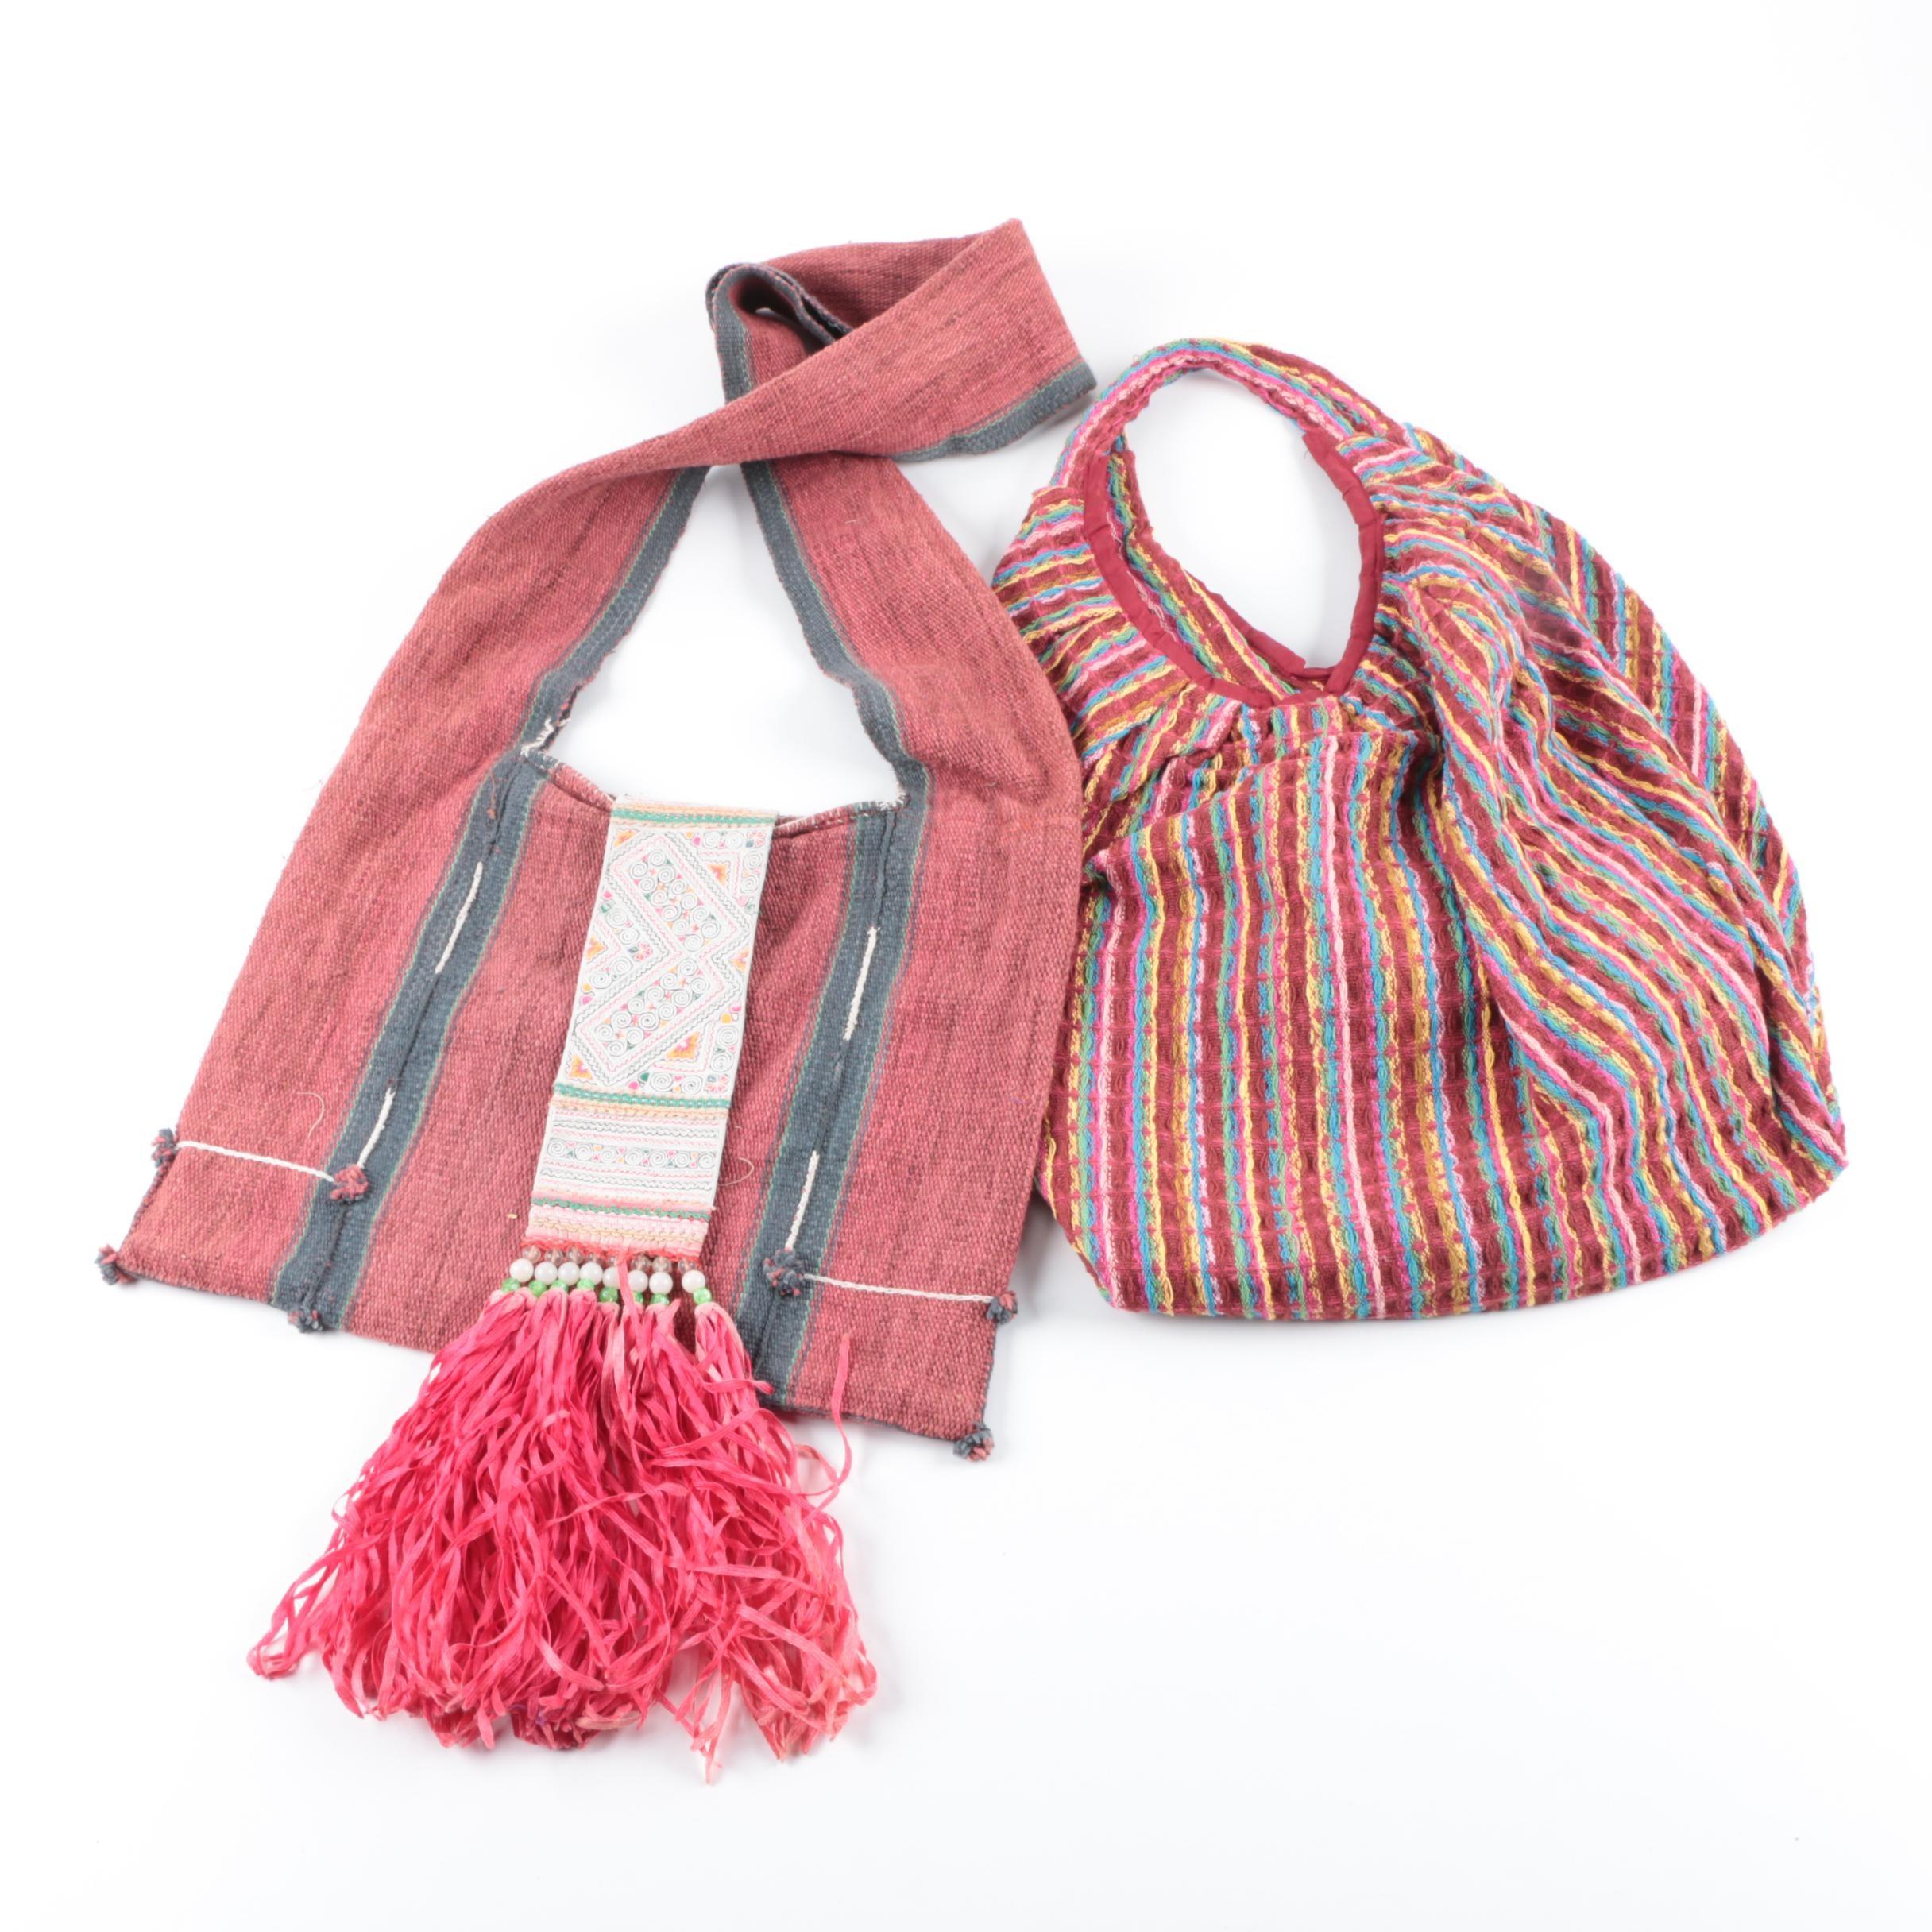 Textile Shoulder Bag and Tote